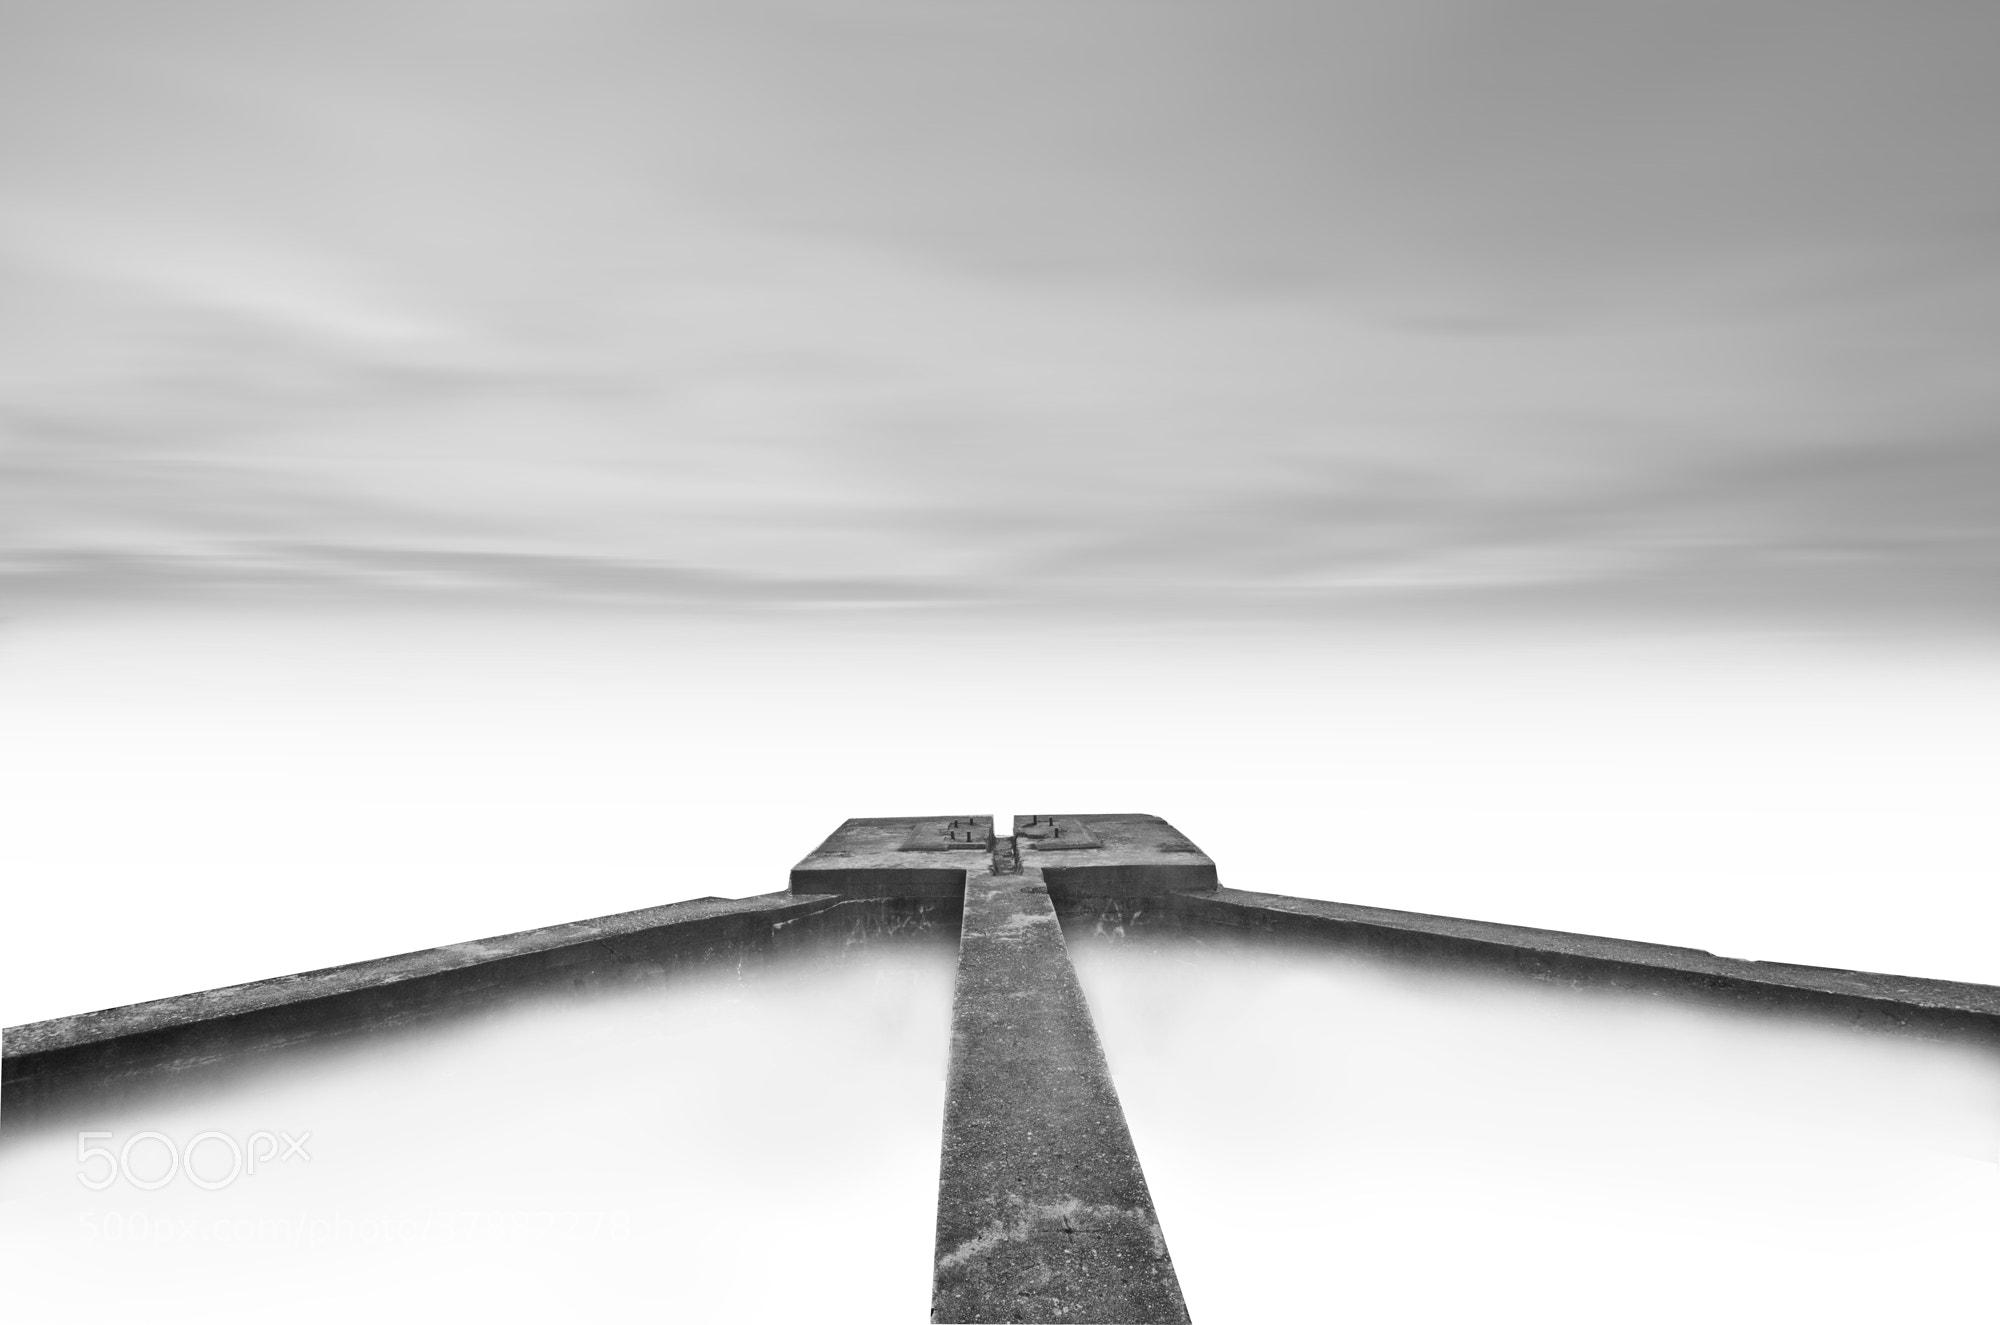 Photograph intersection by Razali Ahmad on 500px